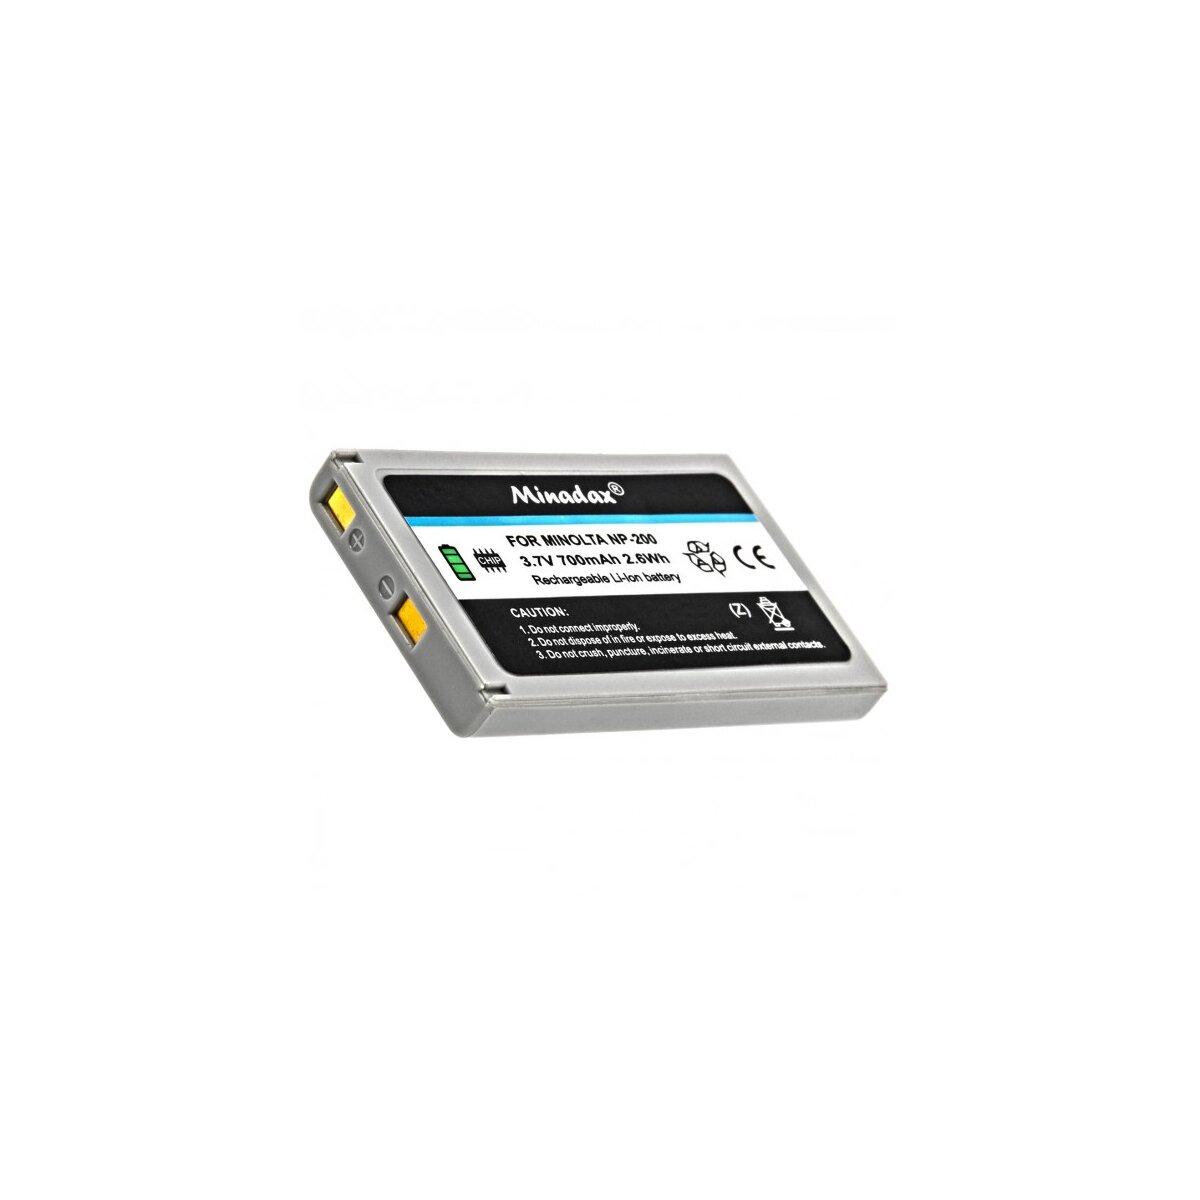 2x Minadax® Qualitaetsakku mit echten 700 mAh fuer Minolta NP-200, wie NP-200 - Intelligentes Akkusystem mit Chip